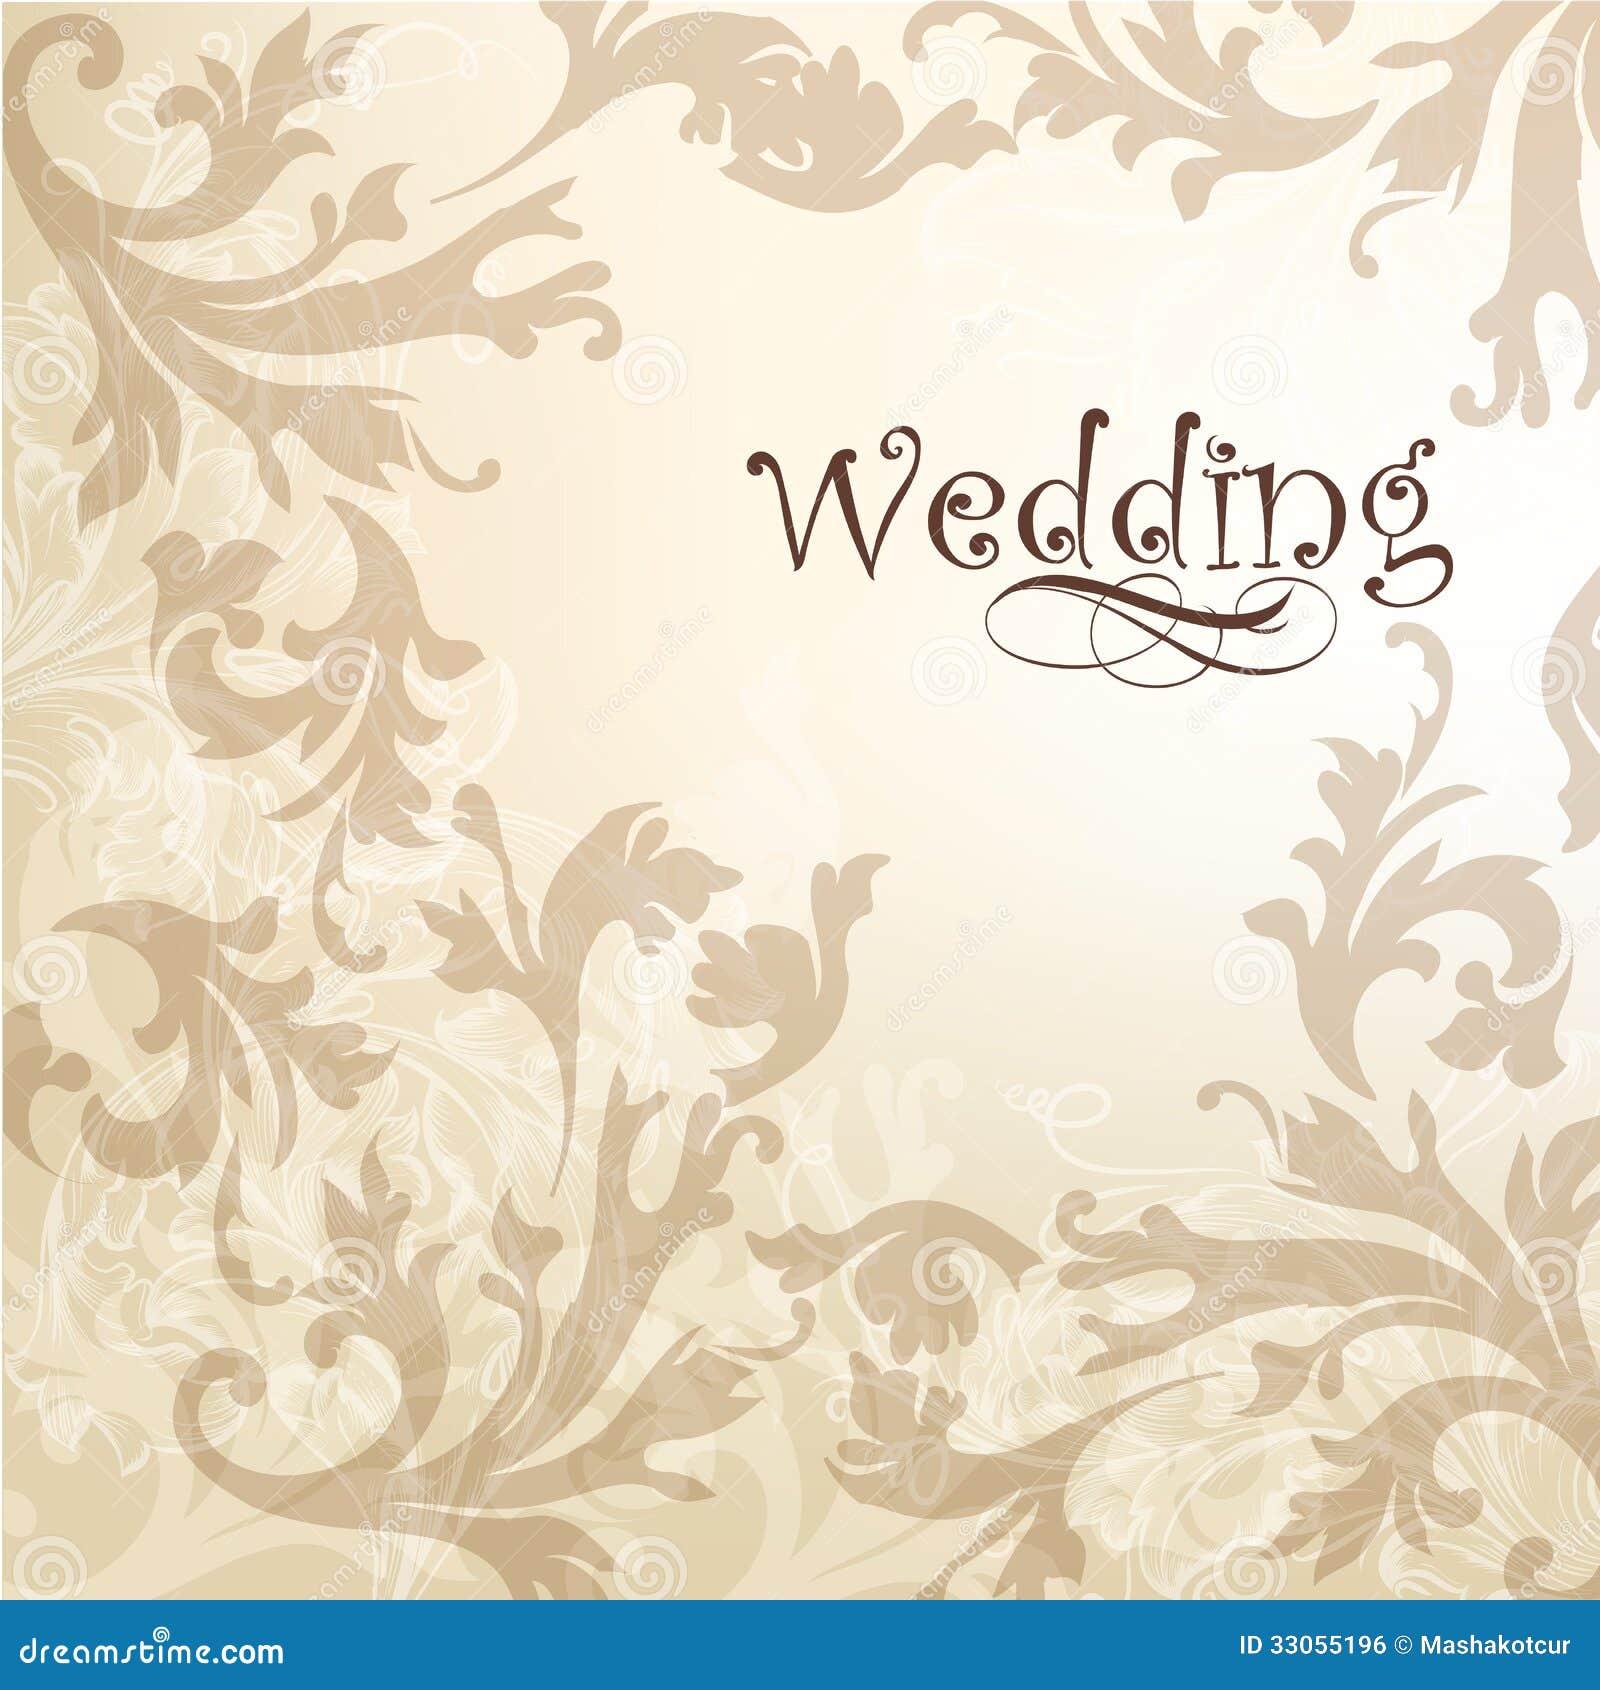 Wedding Elegant Background For Design Royalty Free Stock Image ...